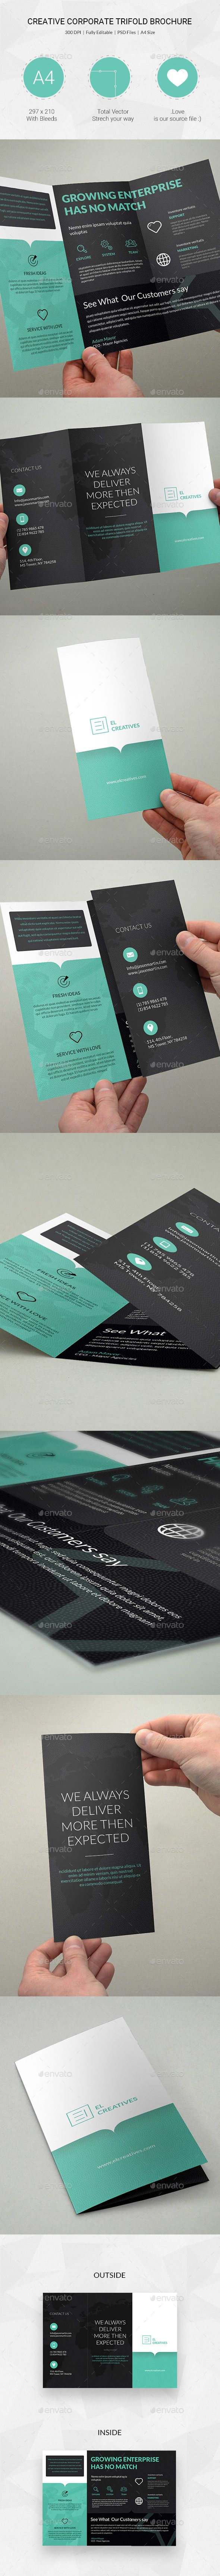 Creative Corporate Trifold Business Brochure Template PSD #design Download: http://graphicriver.net/item/creative-corporate-trifold-business-brochure-21/13540385?ref=ksioks